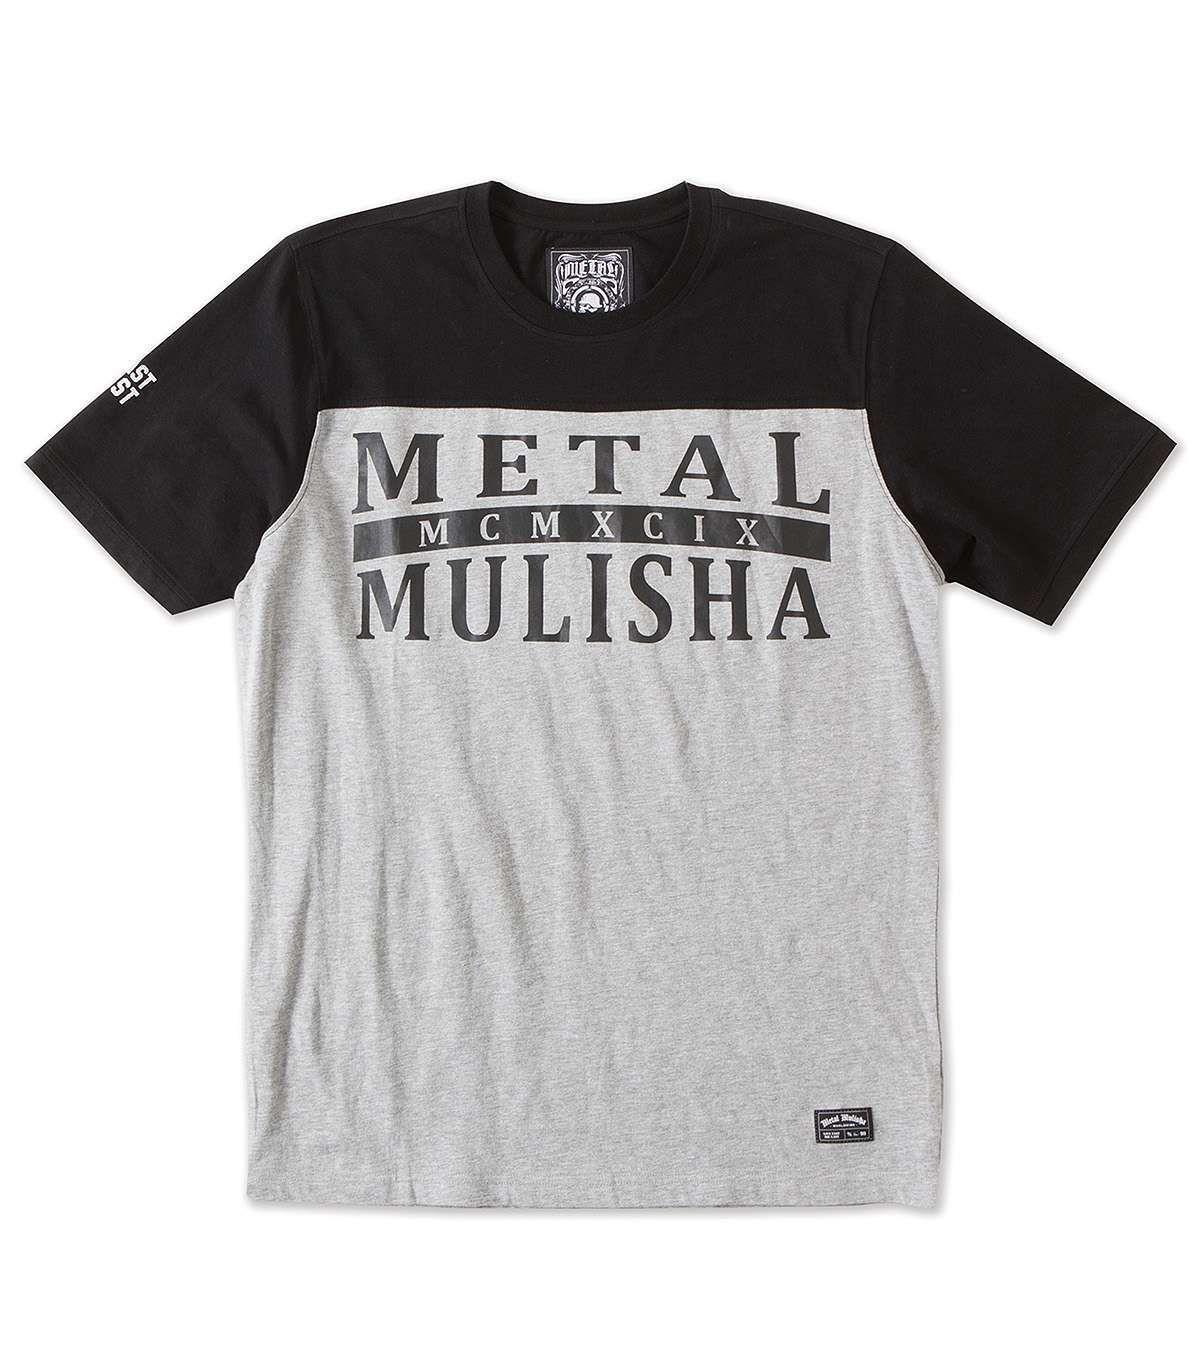 MetalMulisha - Lineman Tee via  Fashion  Orlando  Luquillo  CasaBlanca   FullPiso  astabajoproject  seo 777da04271e